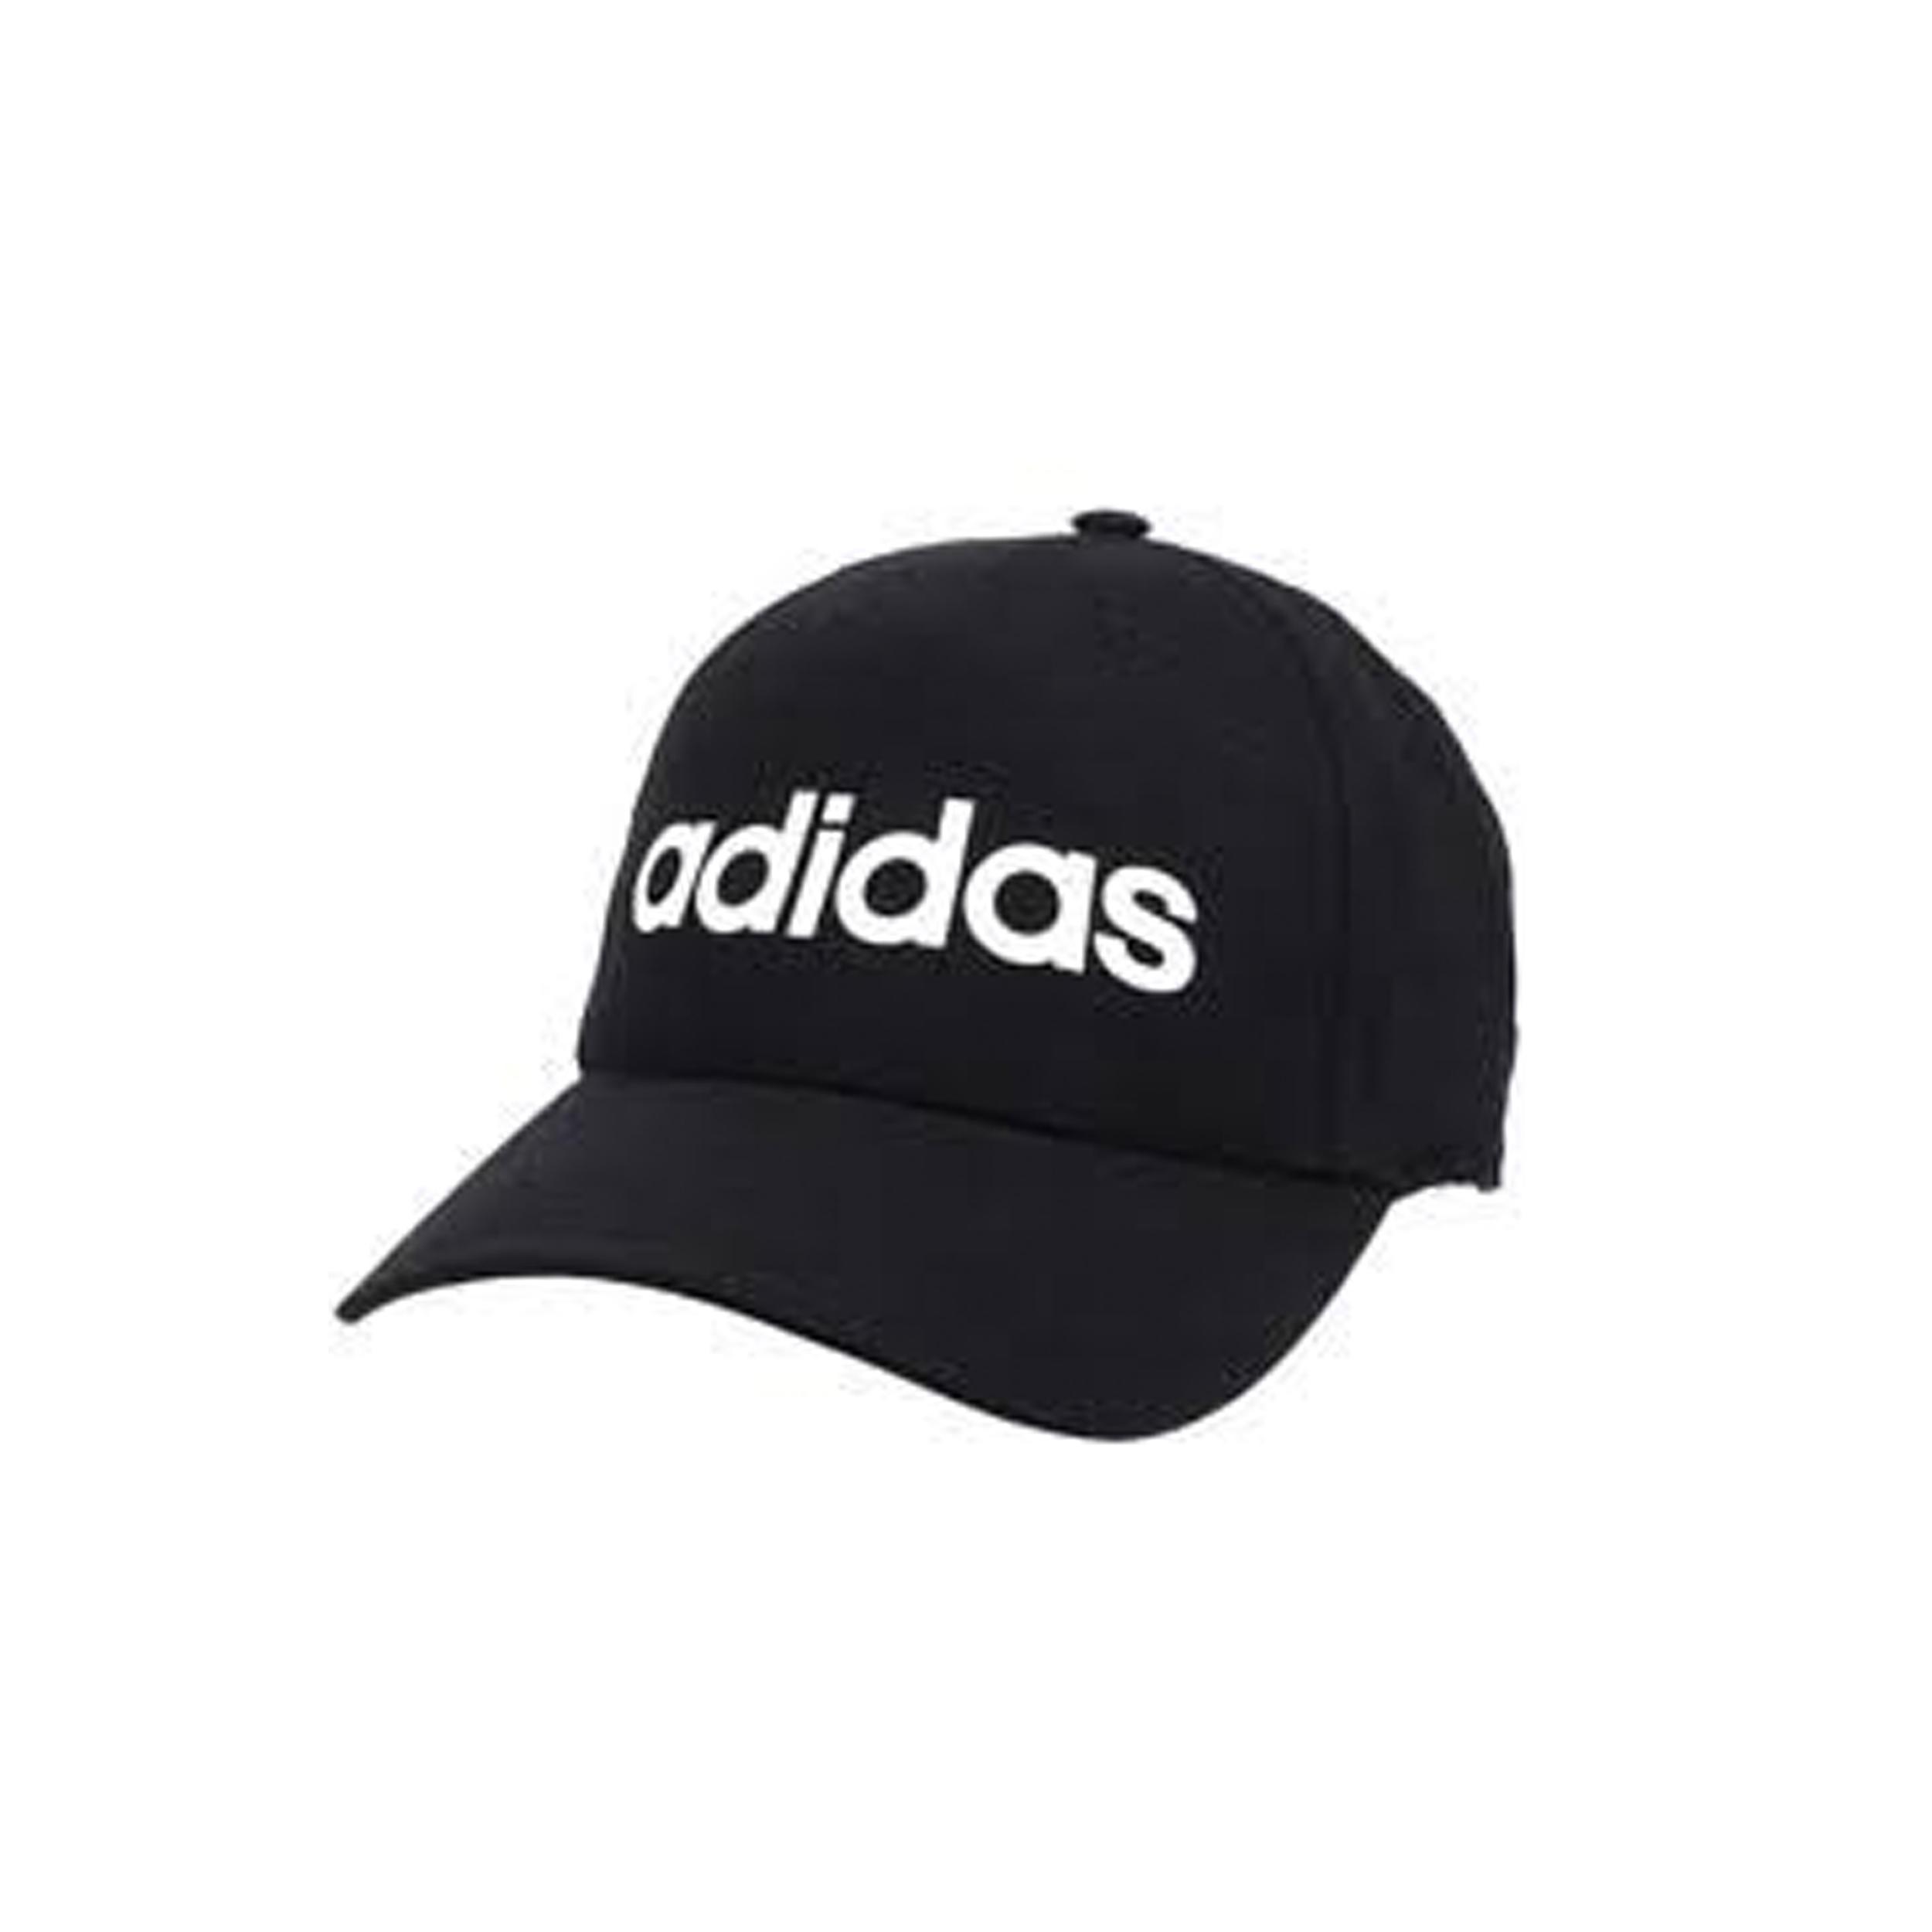 5cb43255e6a Pet of hoed kopen? | Decathlon.nl